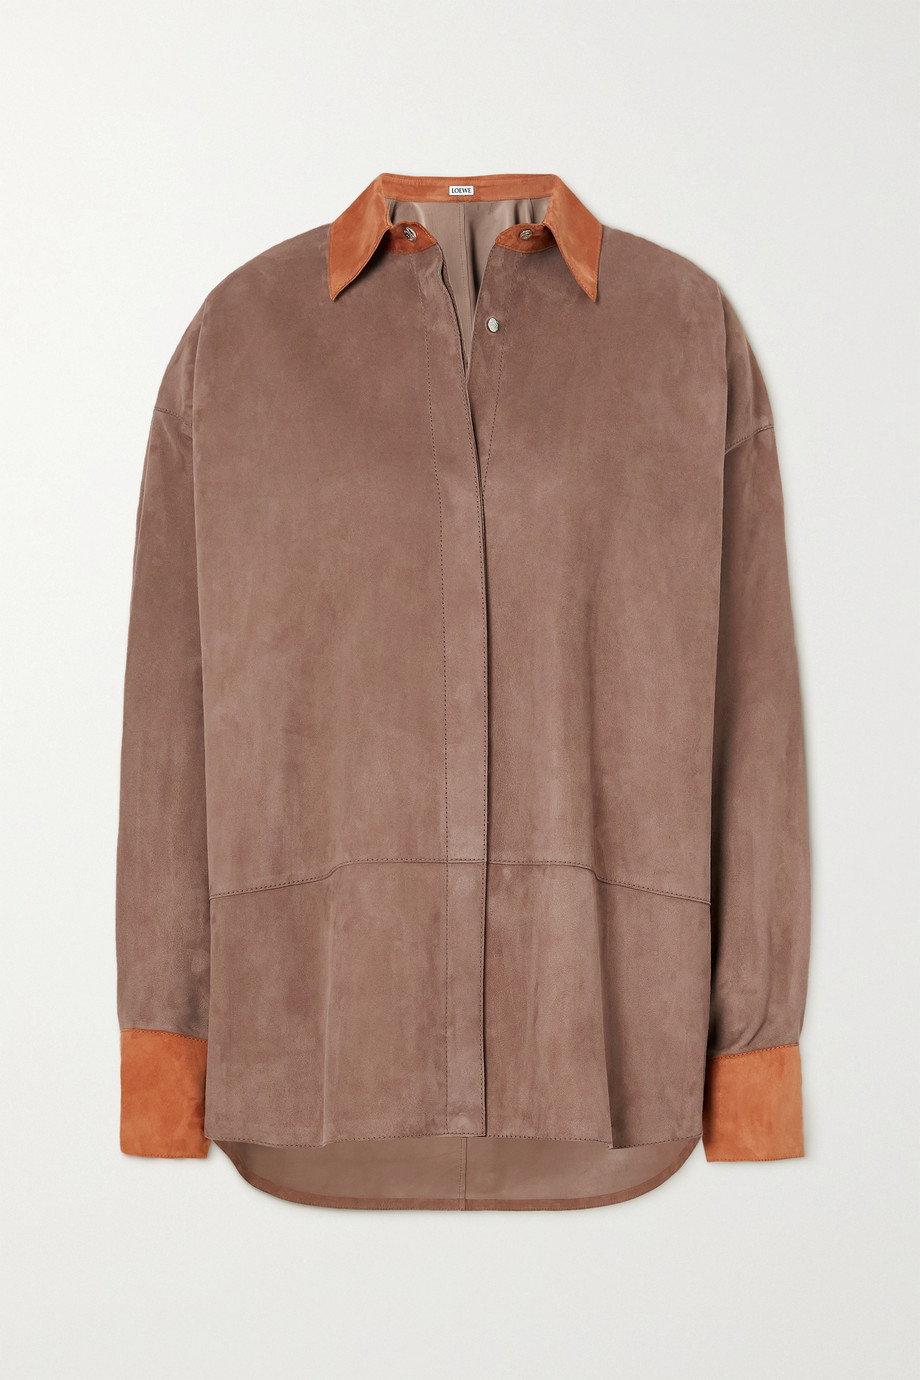 Loewe Oversized two-tone suede shirt